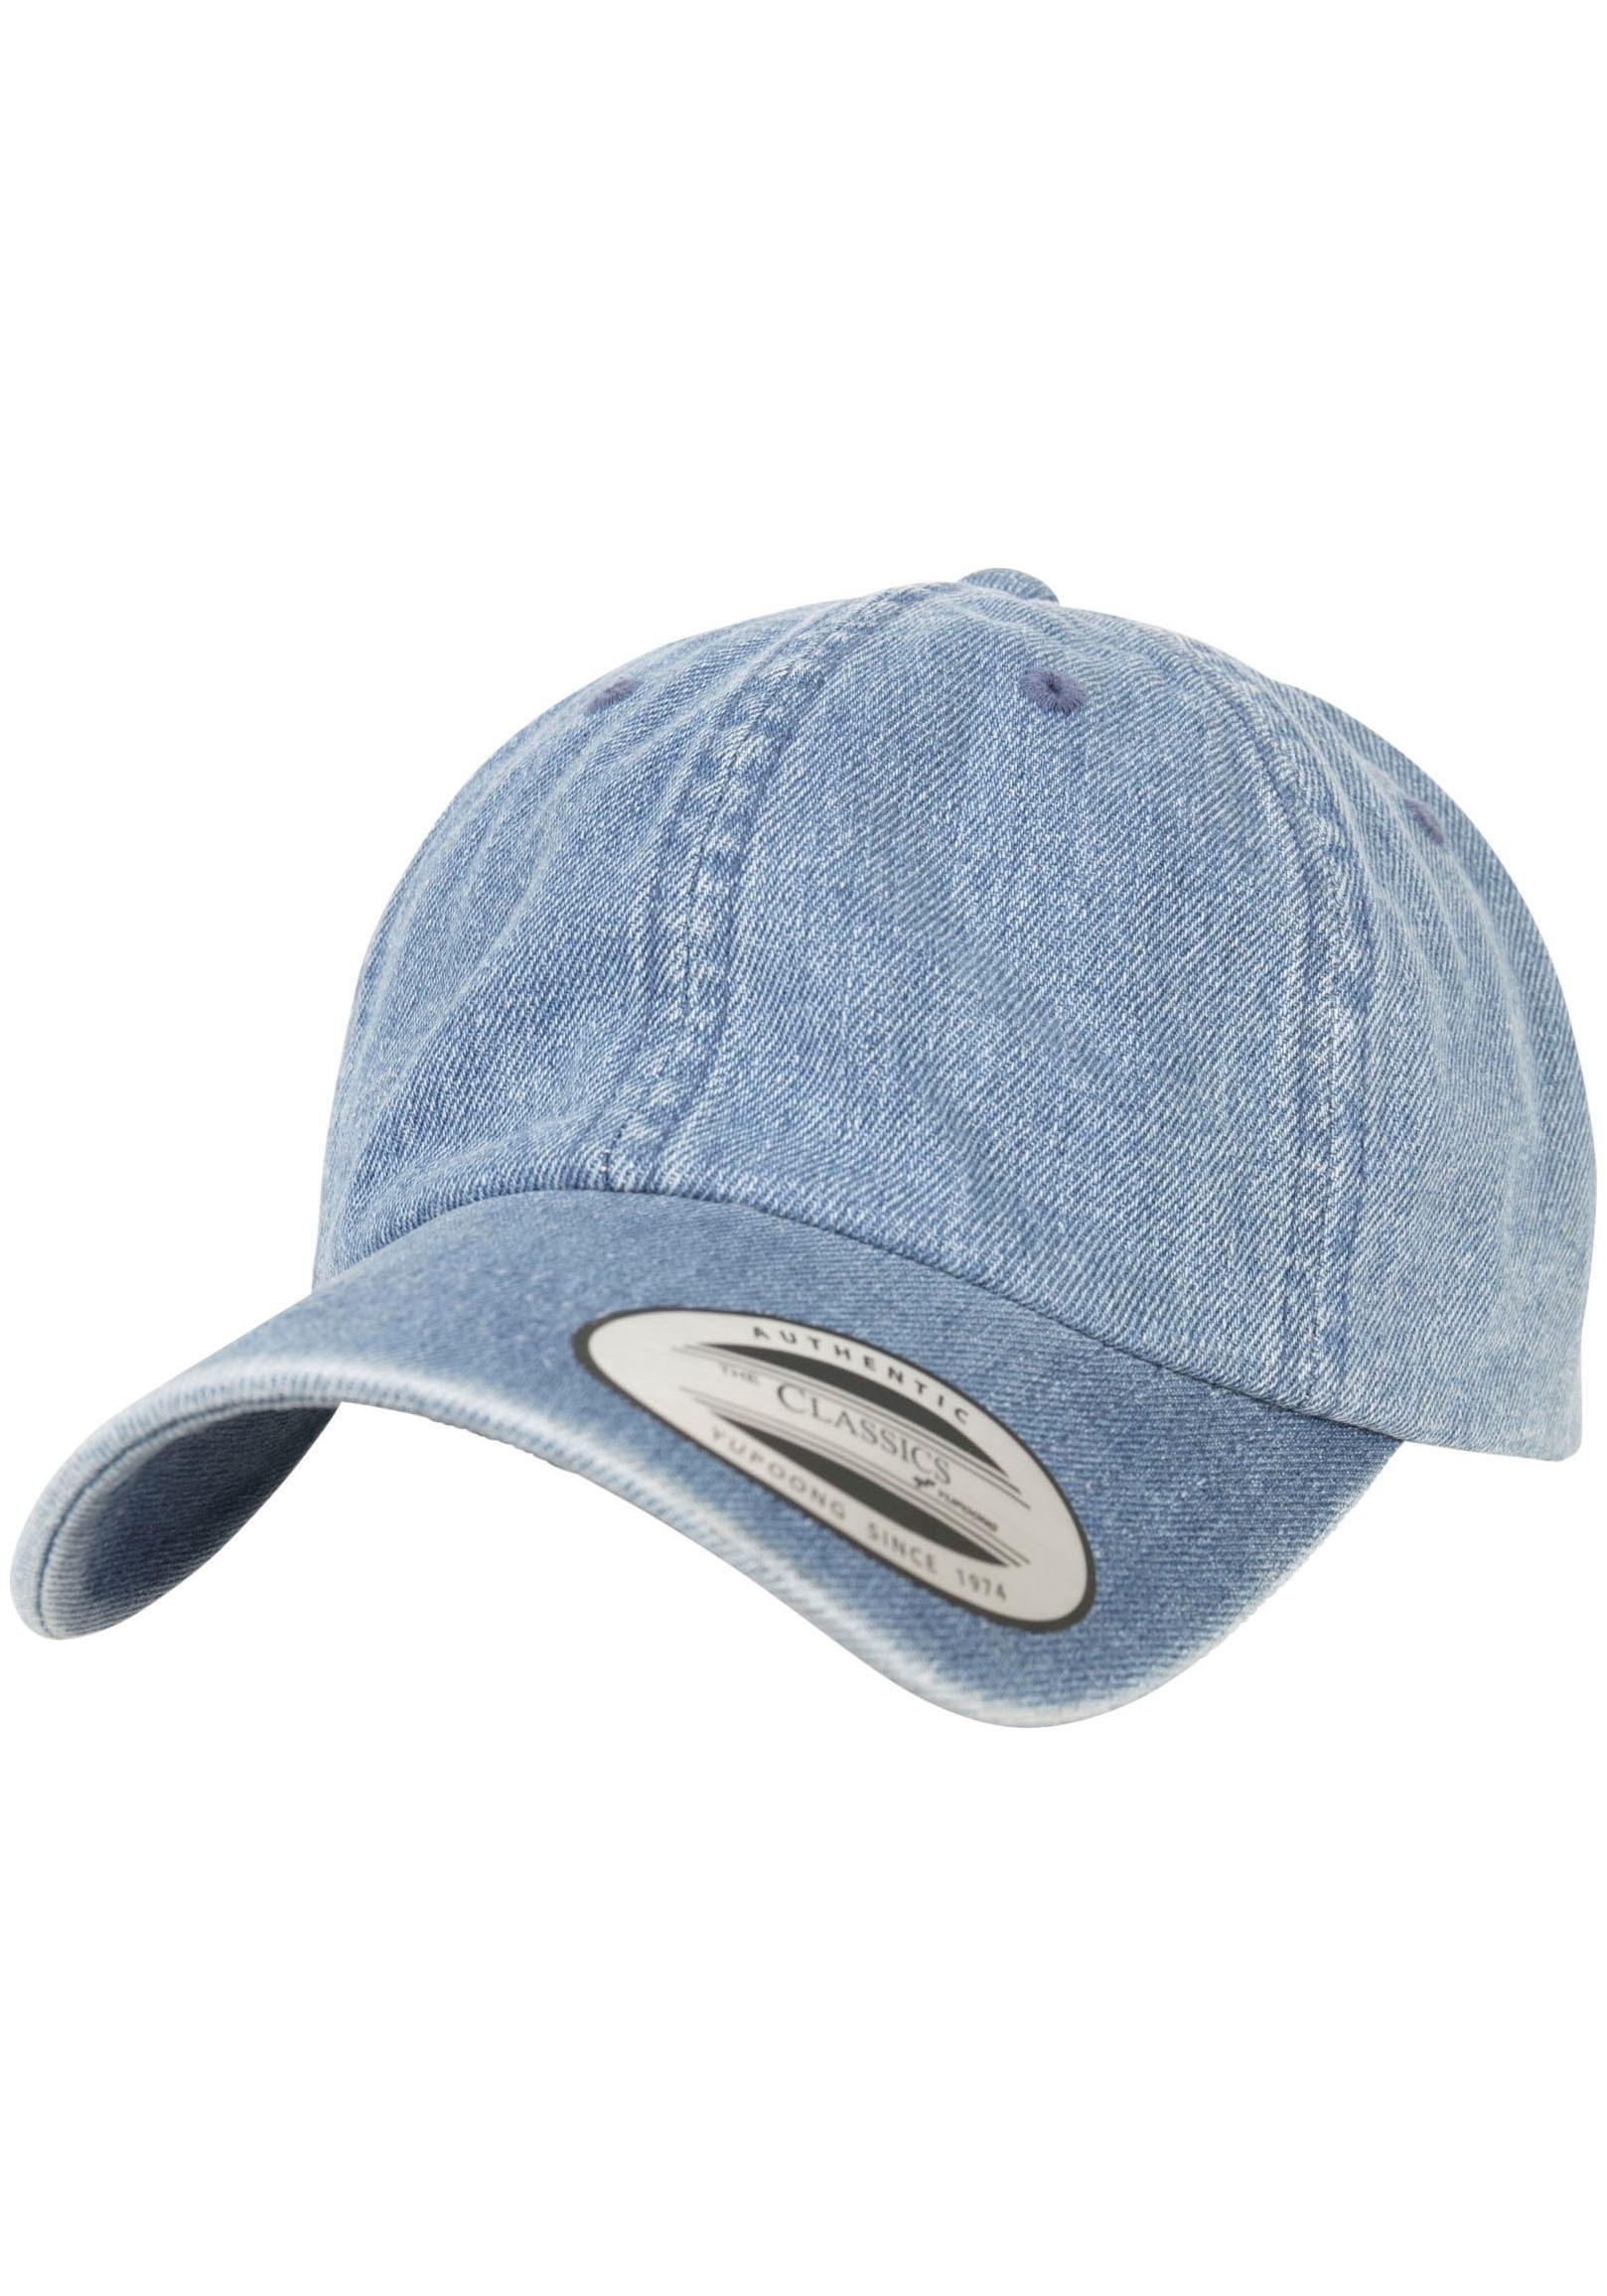 Flexfit Baseball Cap Low Profil Dad Cap, Denim Look, Jeans Style